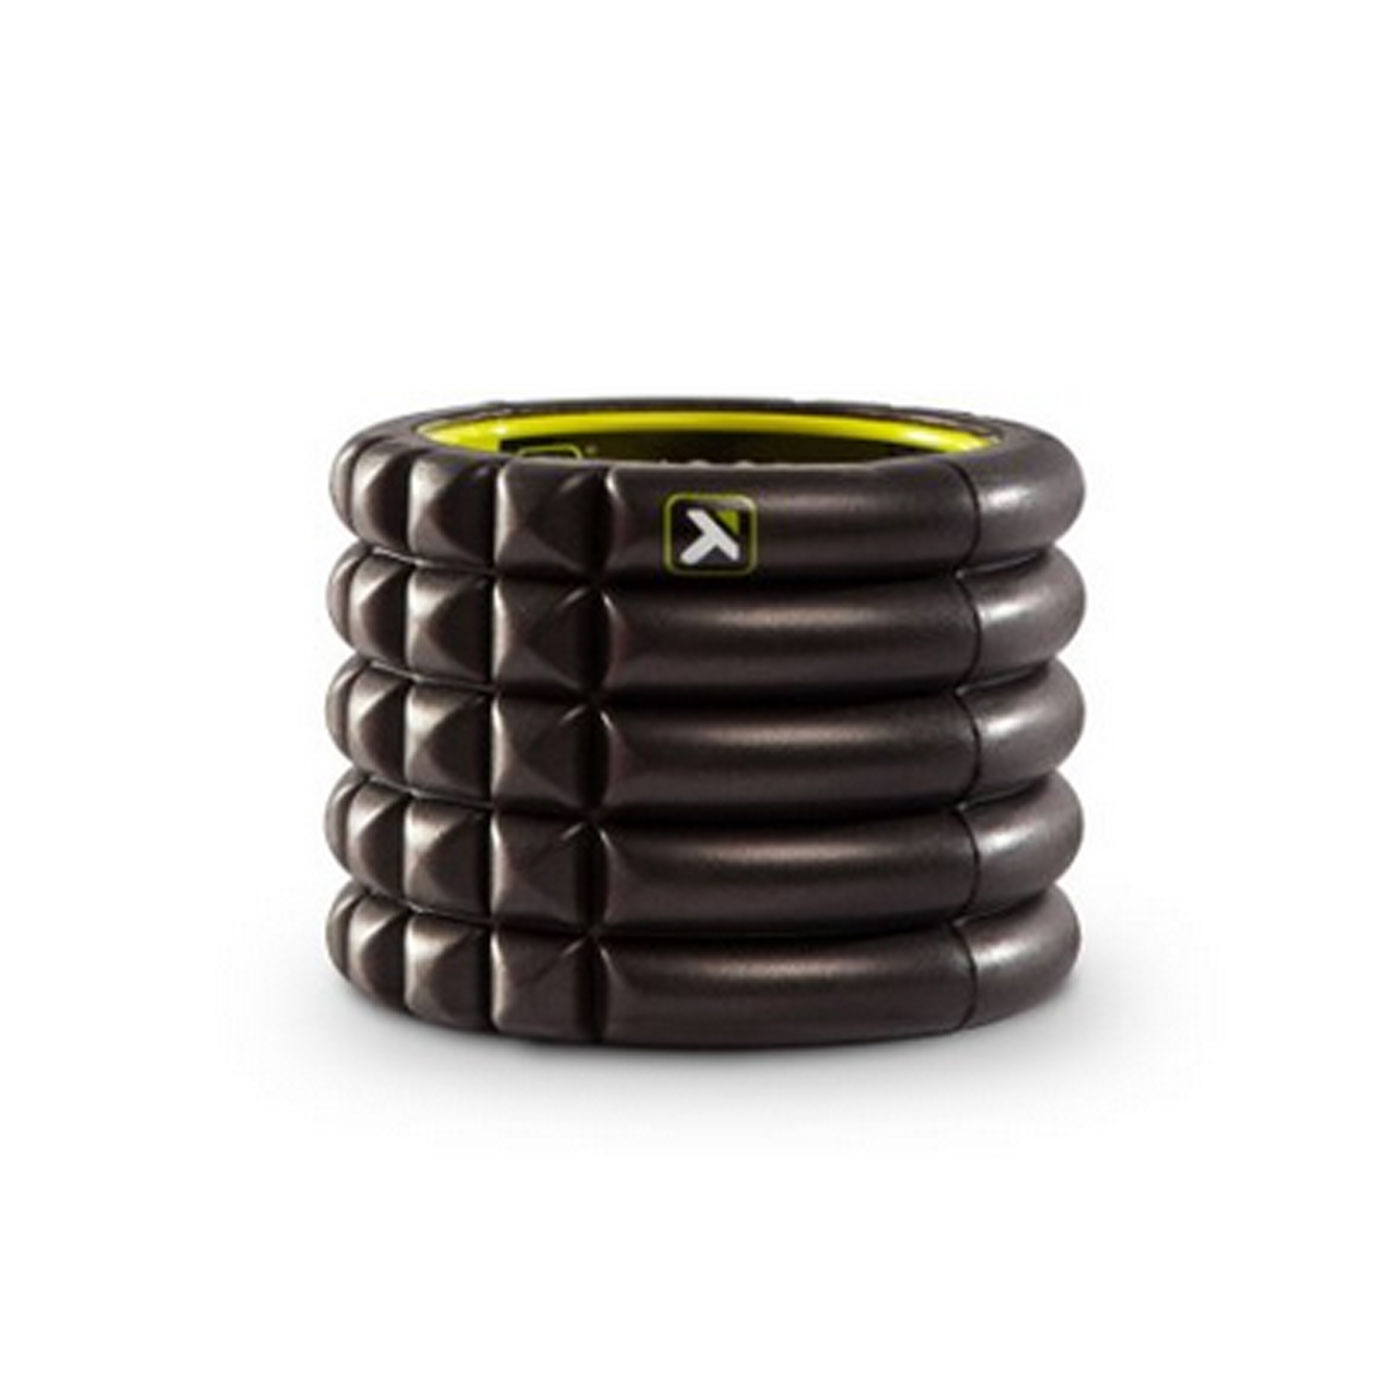 TP• Mini Grid Foam Roller • 20 USD